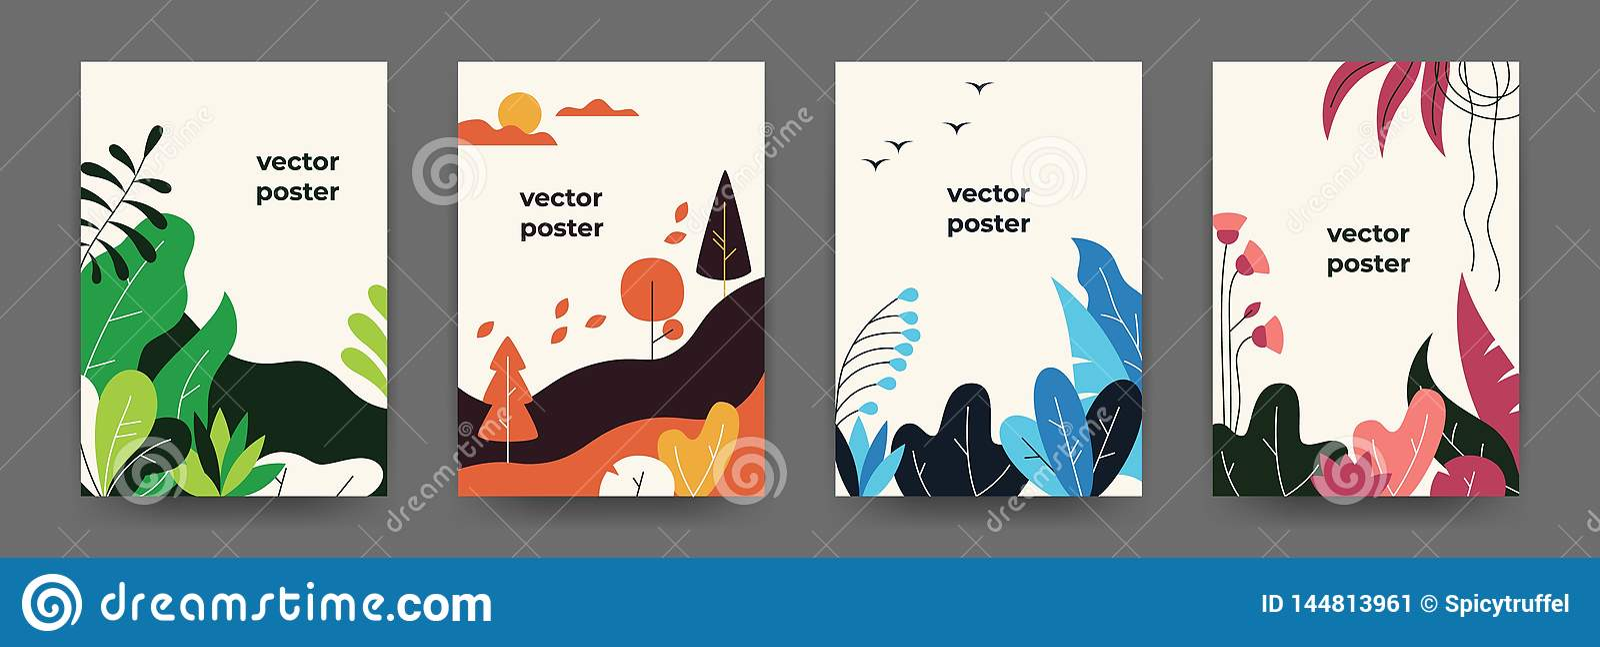 Geometric Space Vector Art Poster